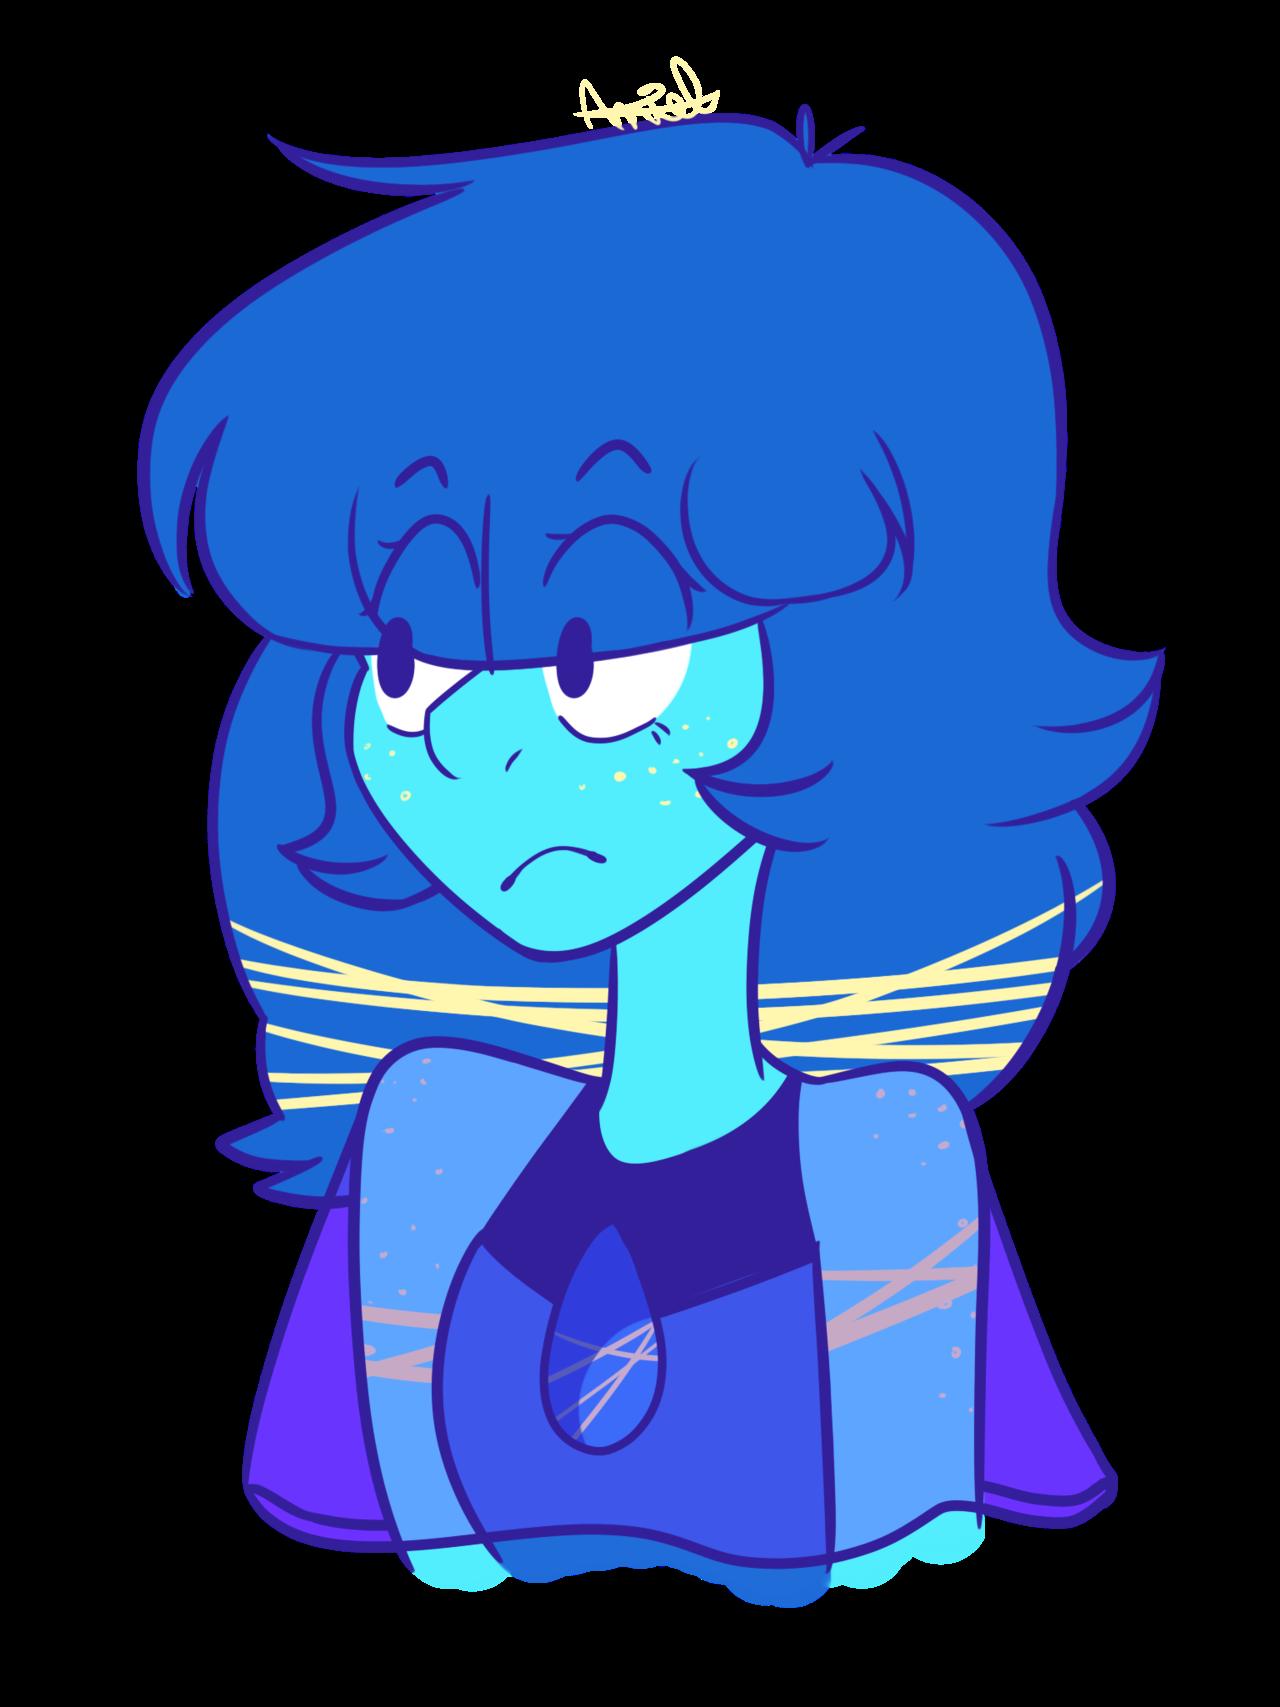 A Lapis Lazuli OC I doodled the other night.